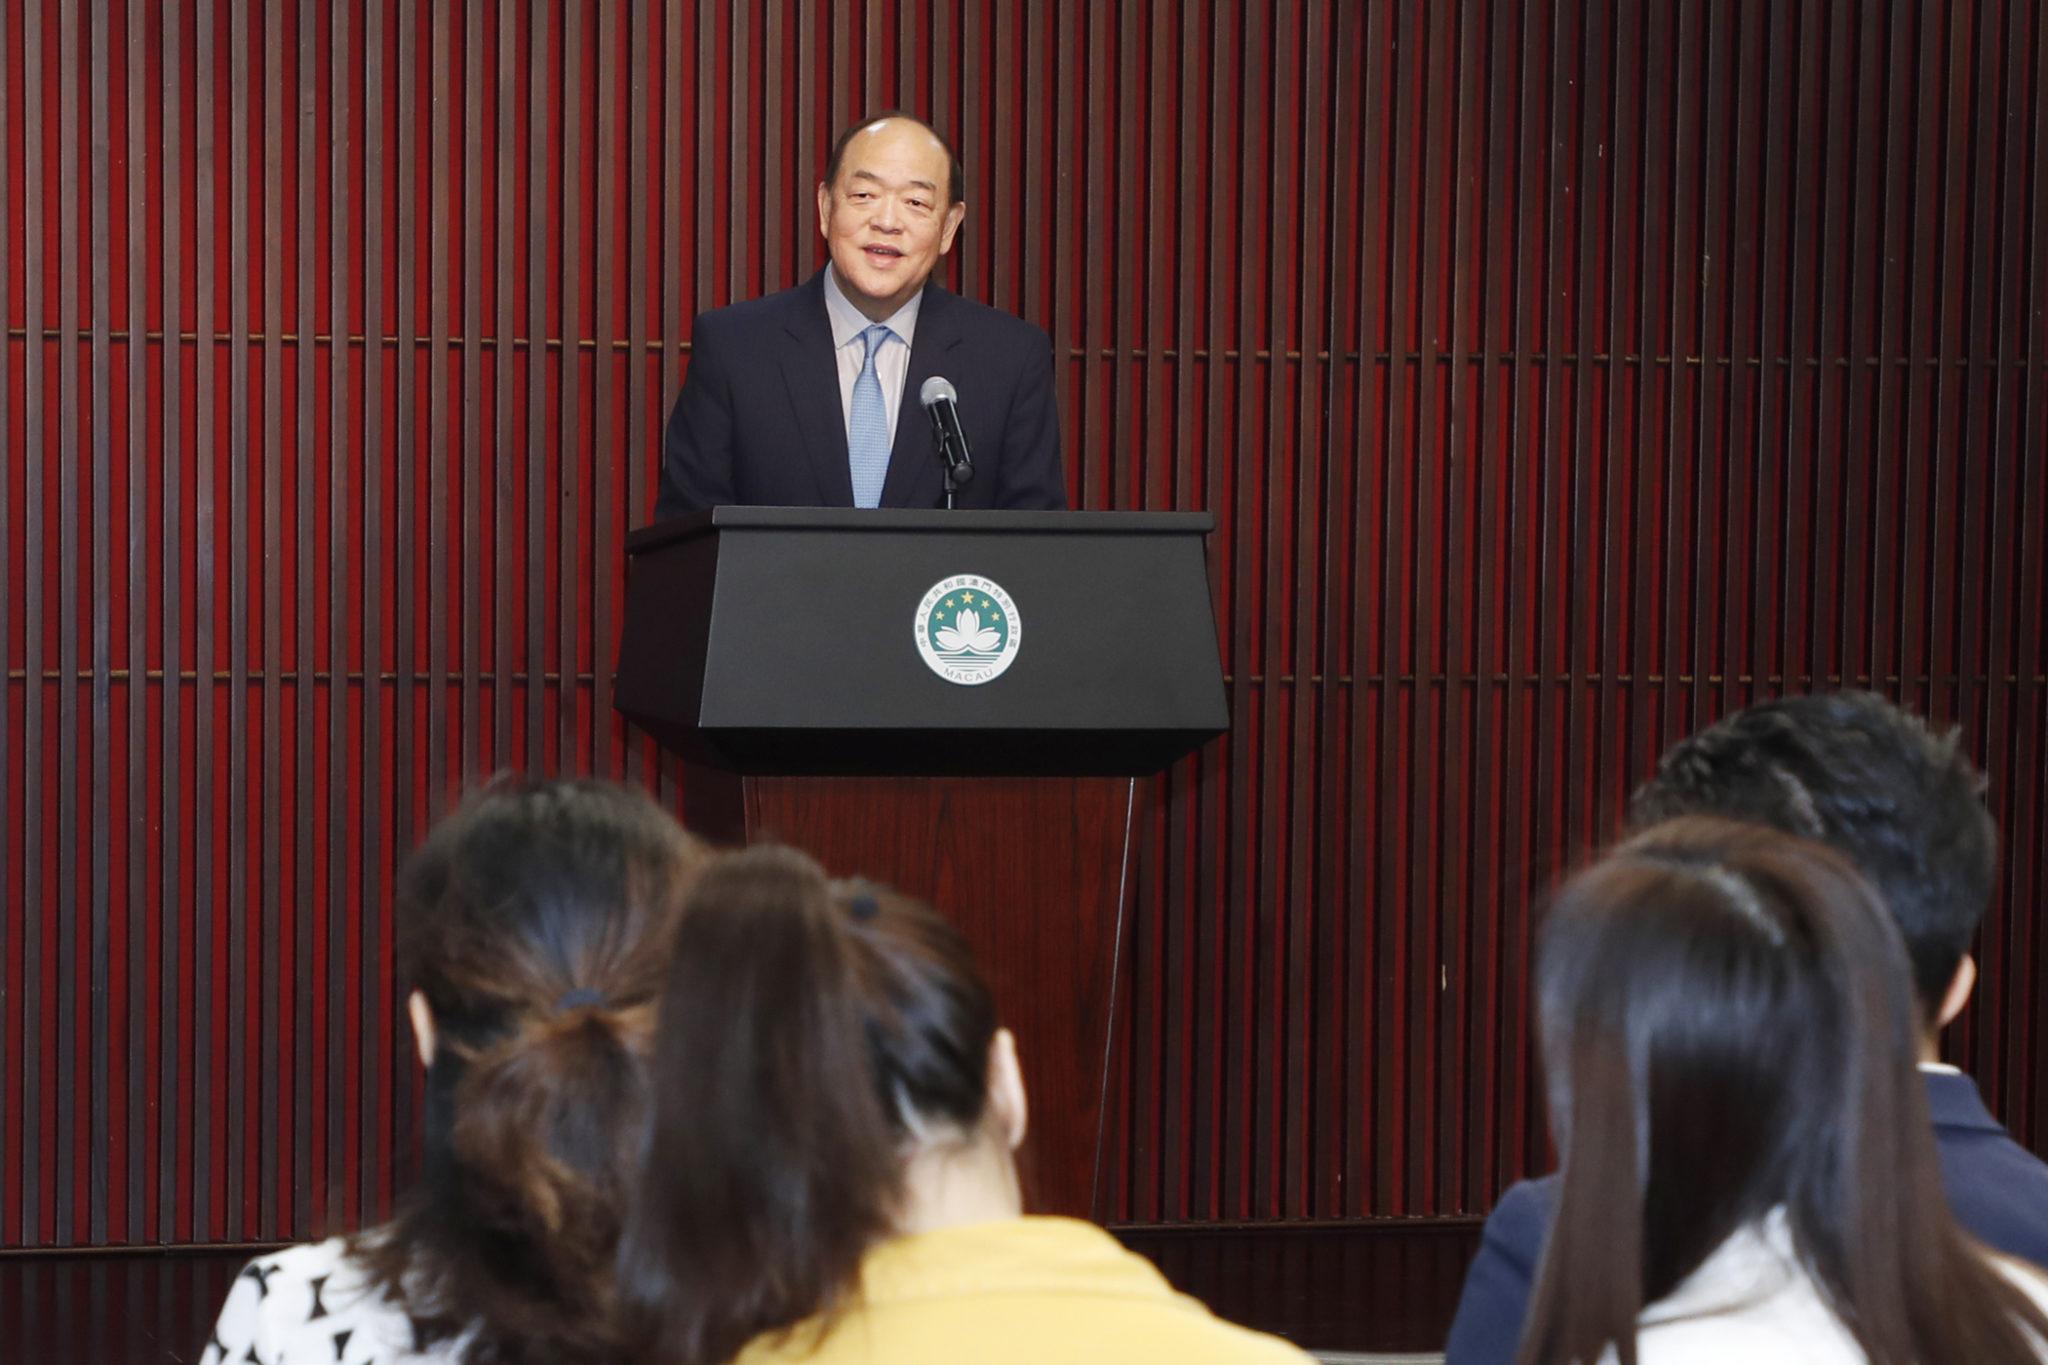 Pequim | Chui Sai On promete transmitir directrizes a Ho Iat Seng